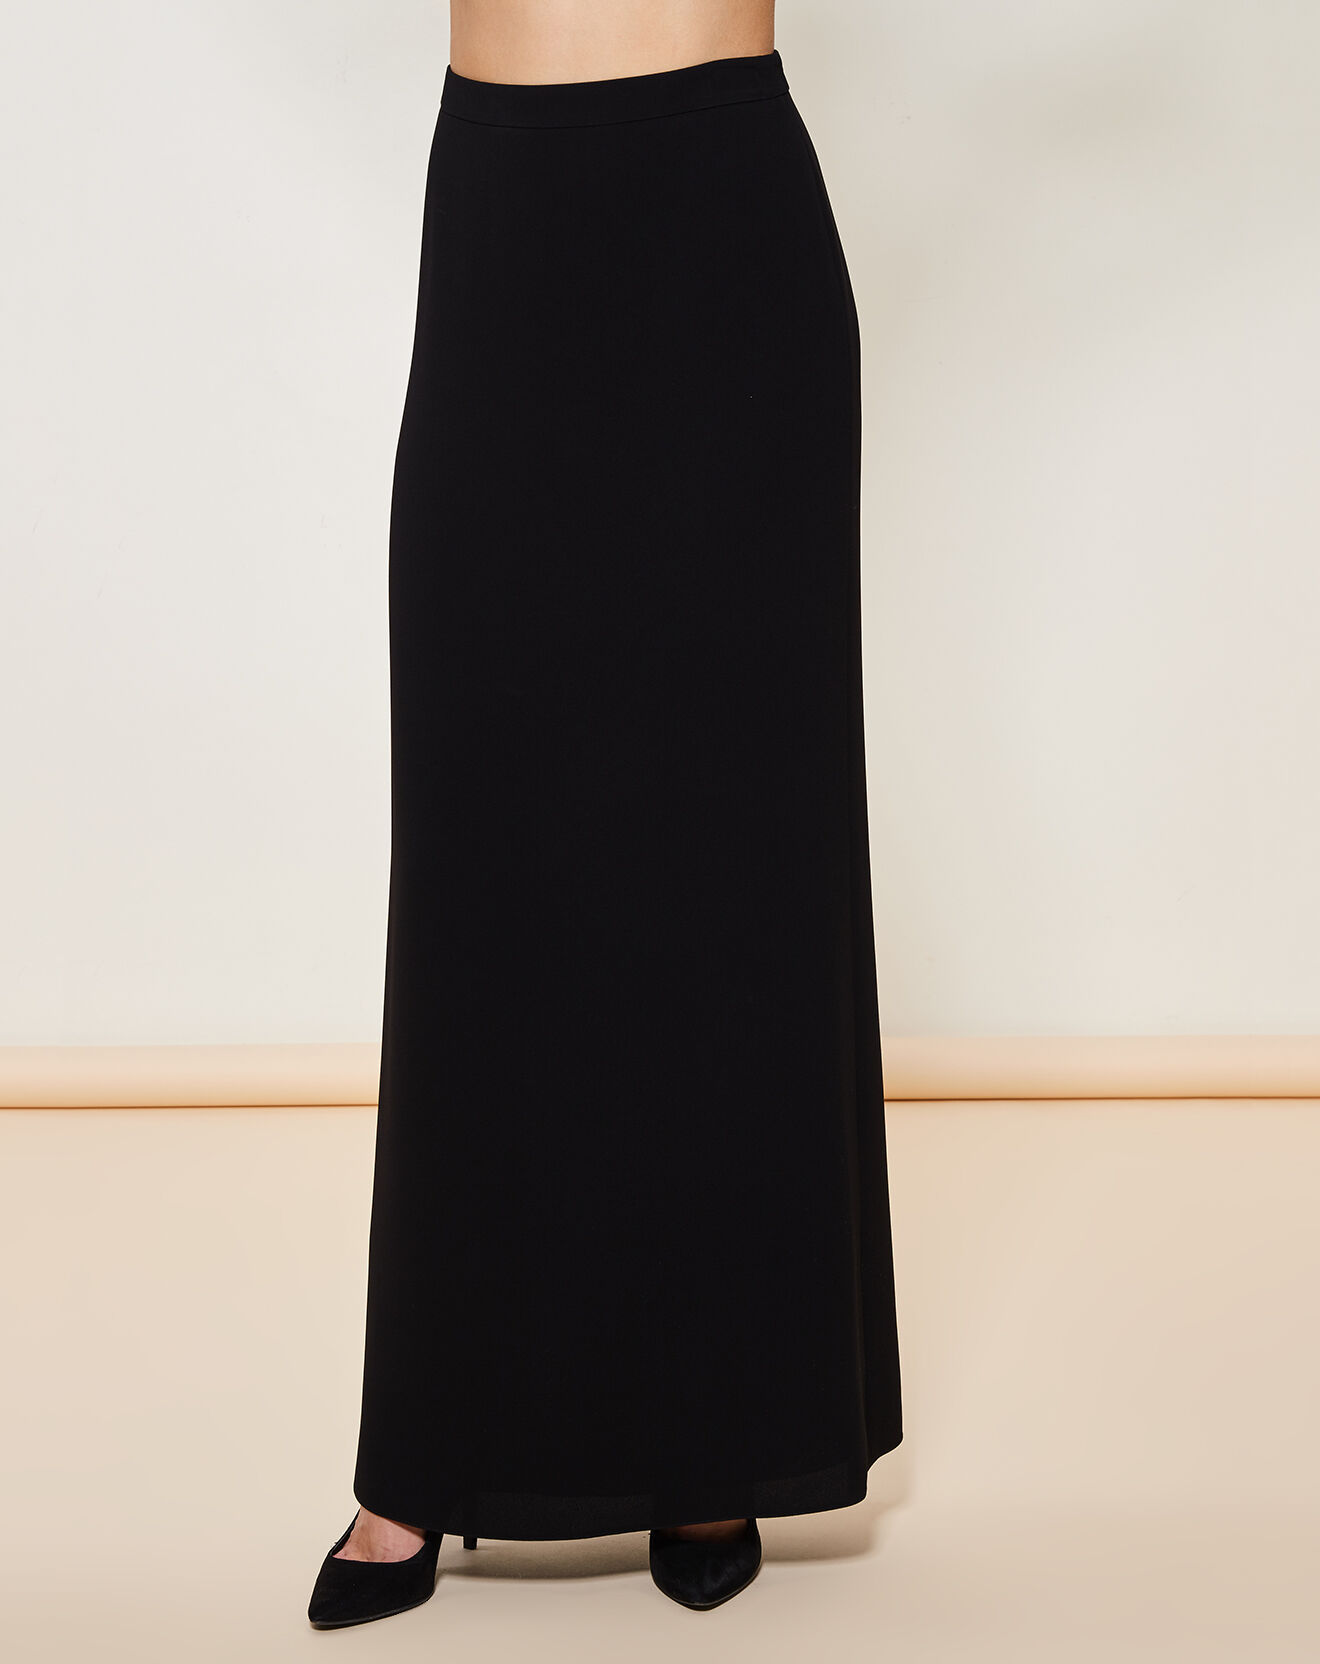 Jupe longue fluide noire - Giorgio Armani - Modalova